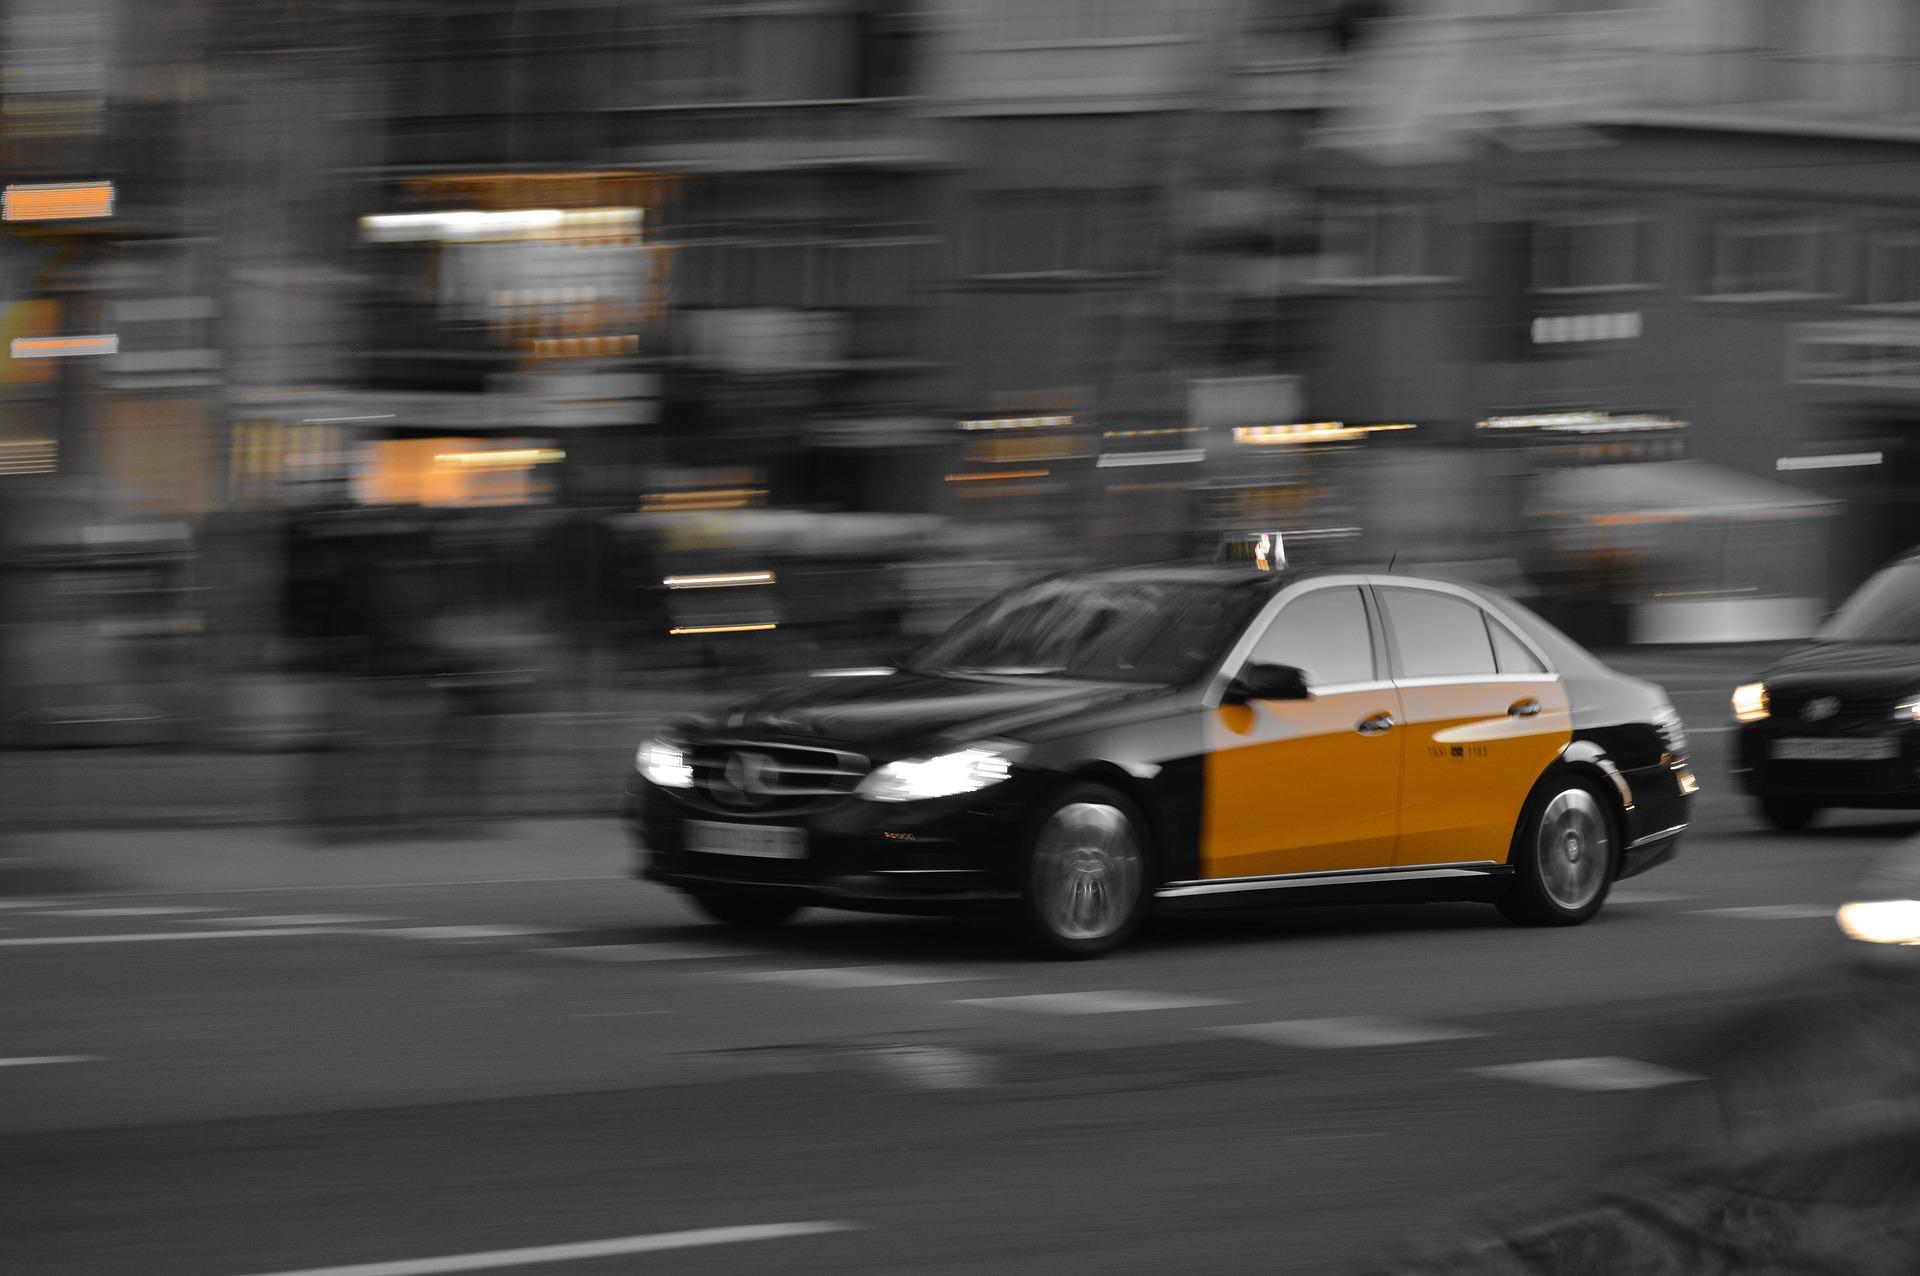 Taxi service Barcelona